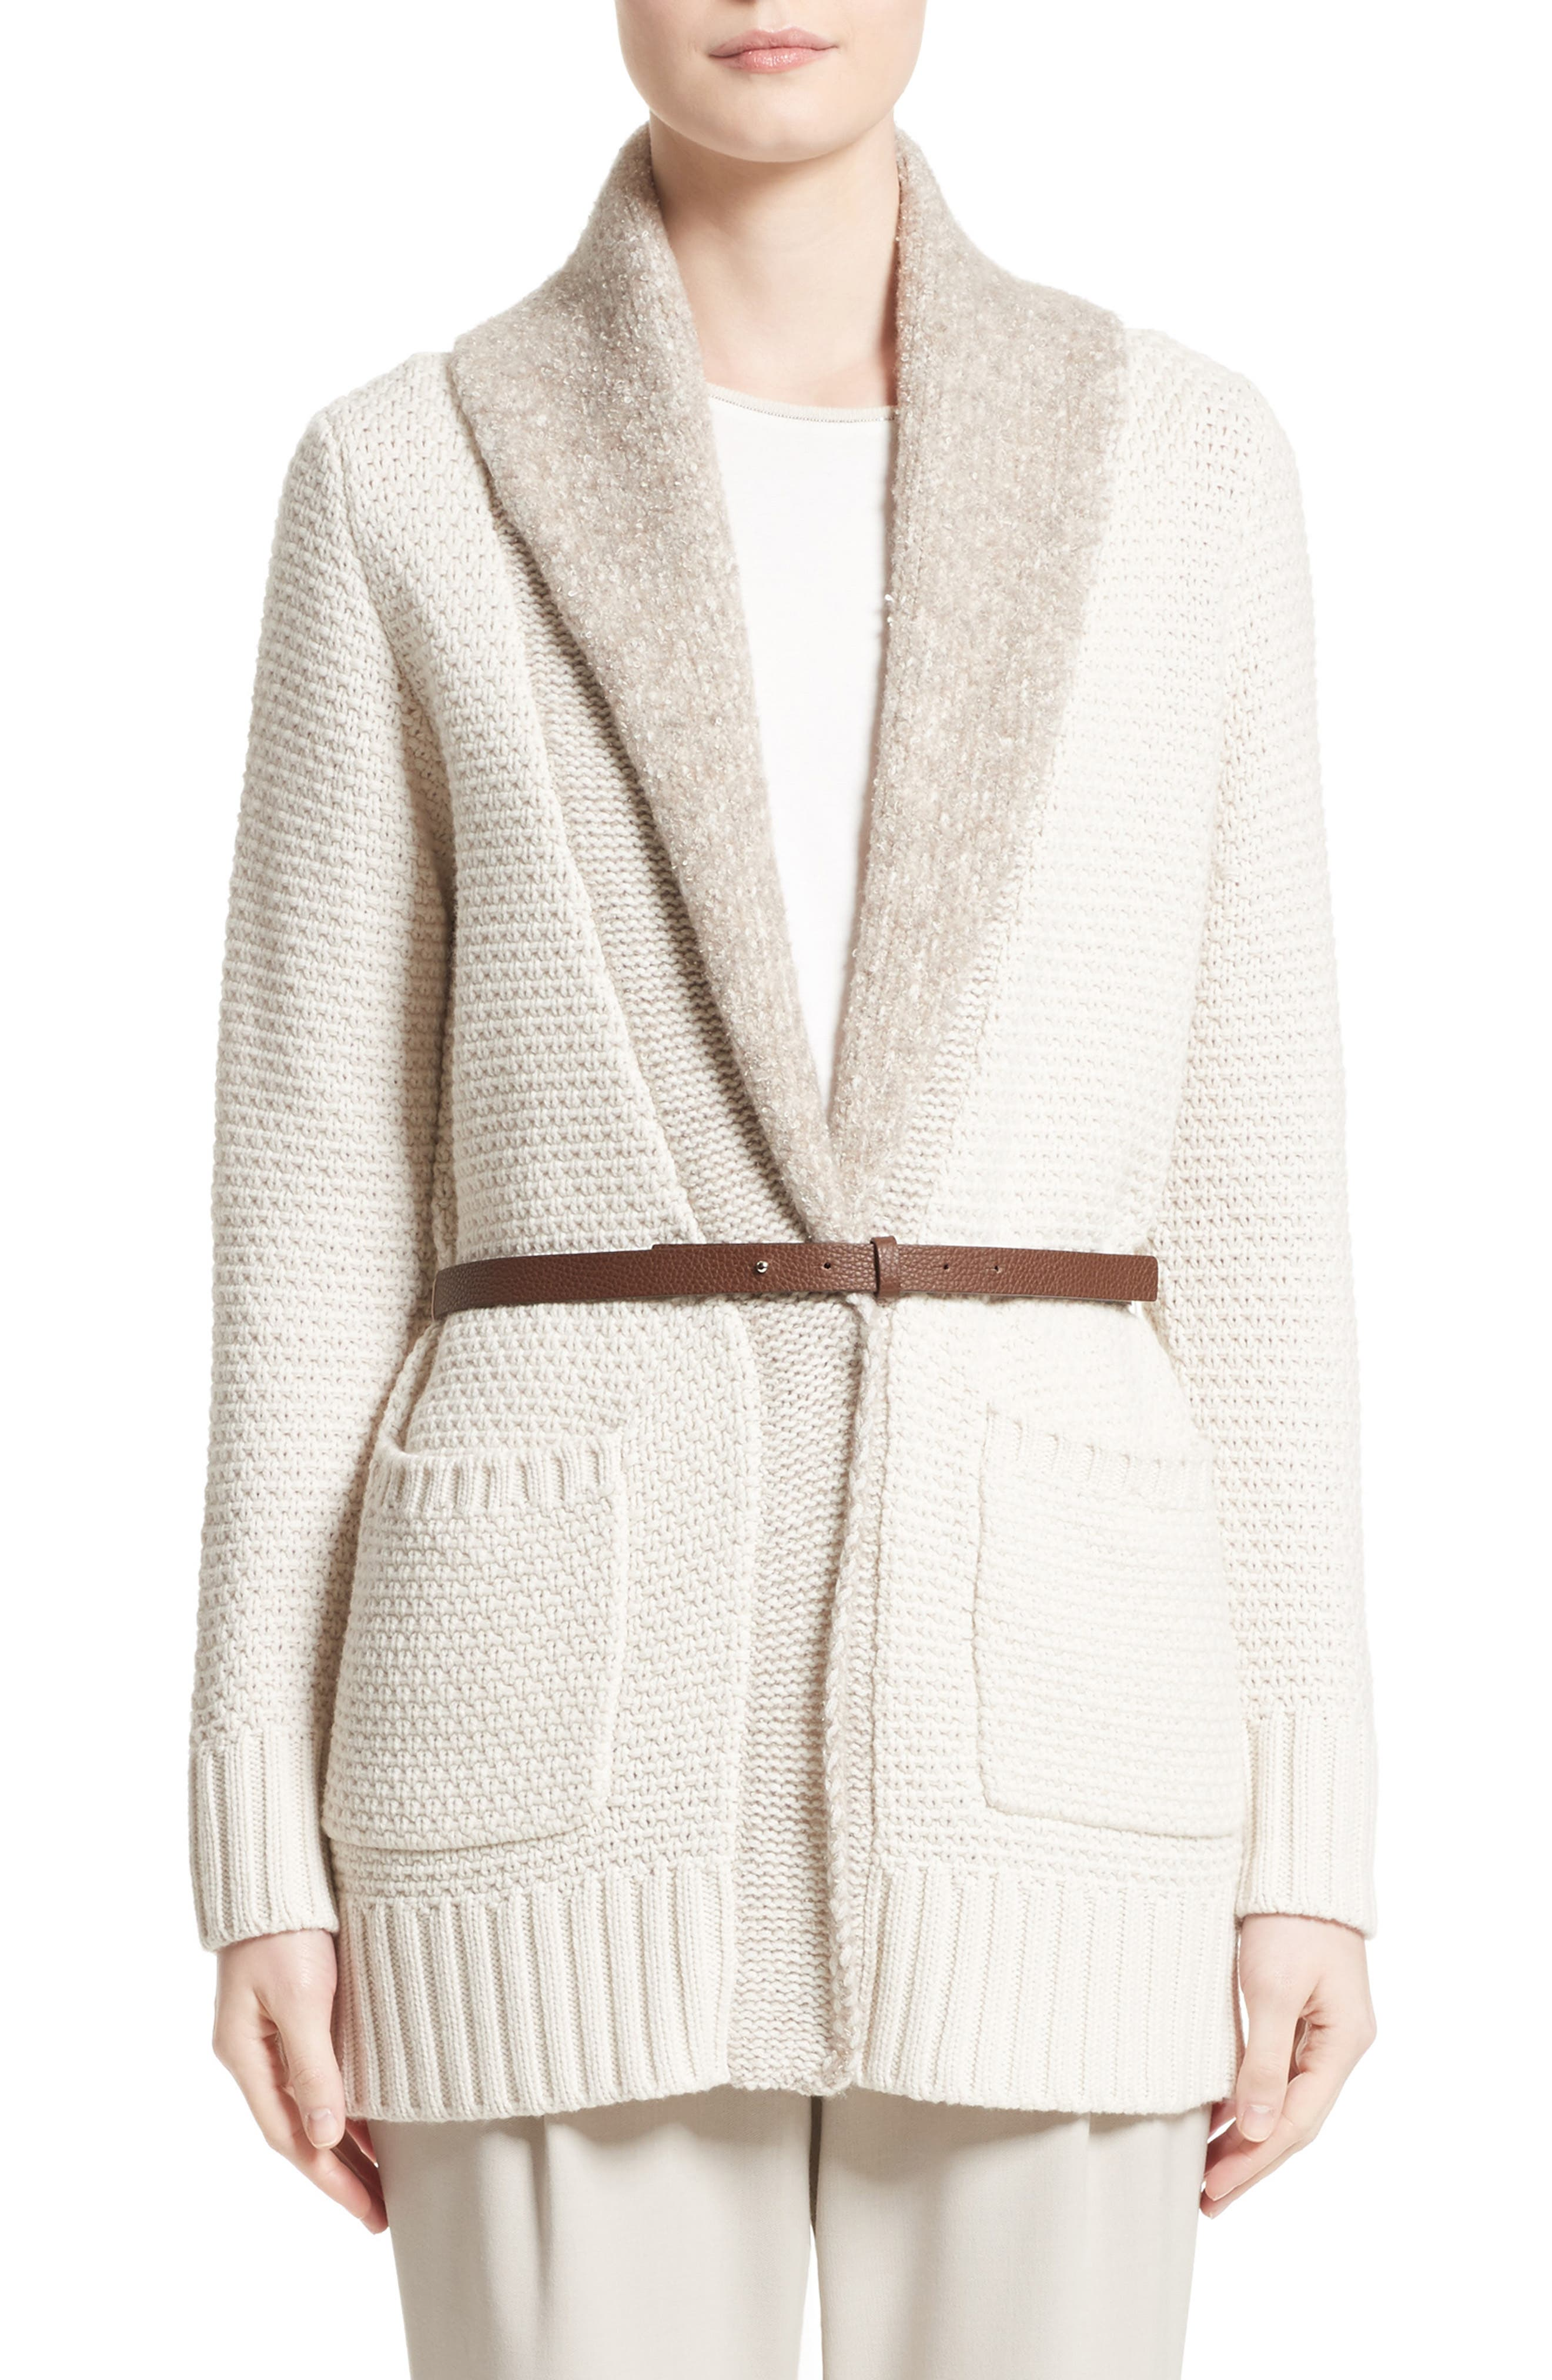 Wool, Silk & Cashmere Knit Cardigan,                         Main,                         color, Ecru